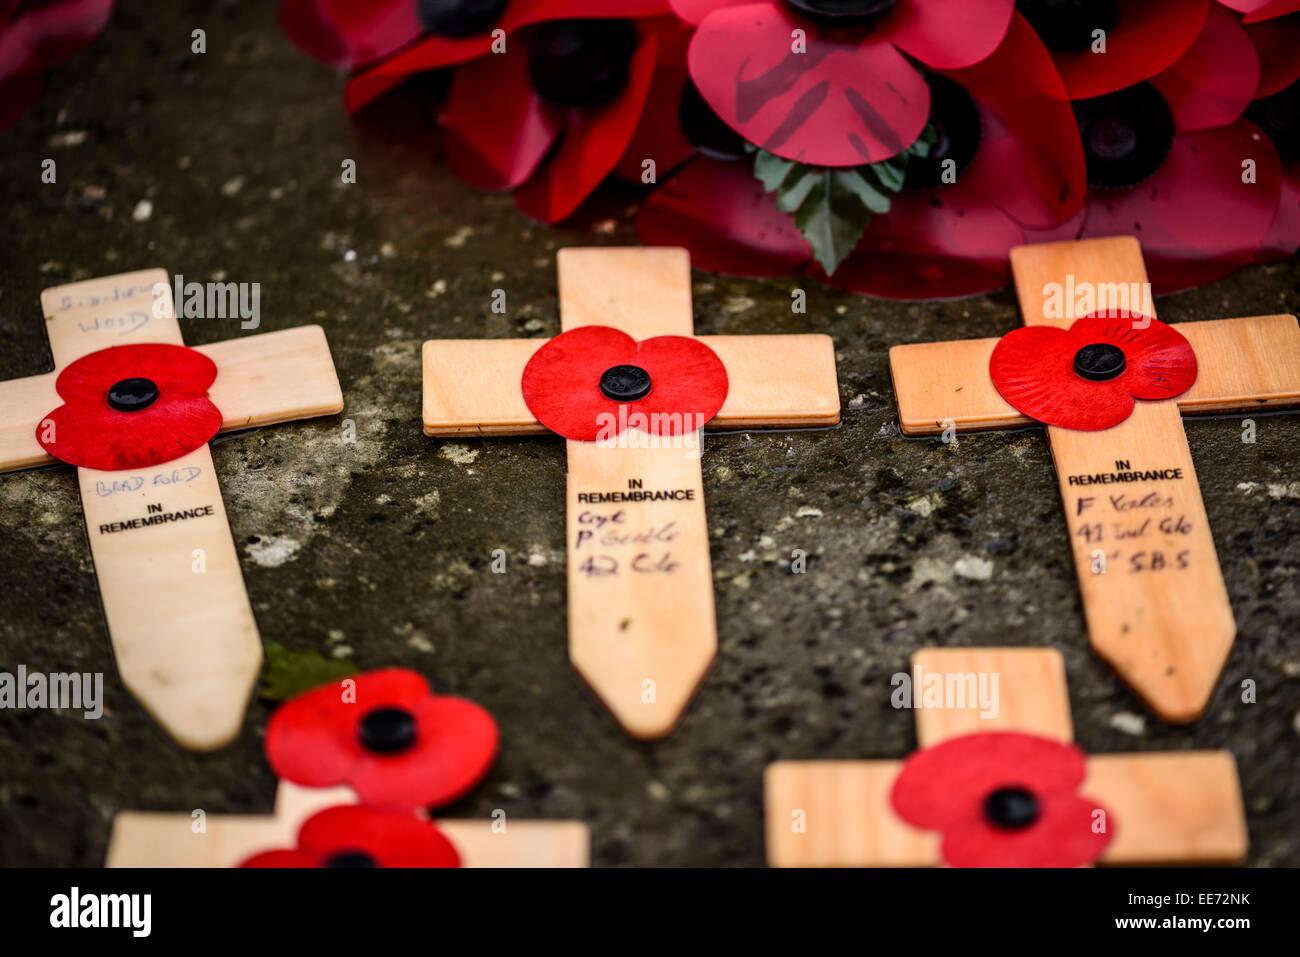 five-crosses-in-front-of-a-poppy-wreath-